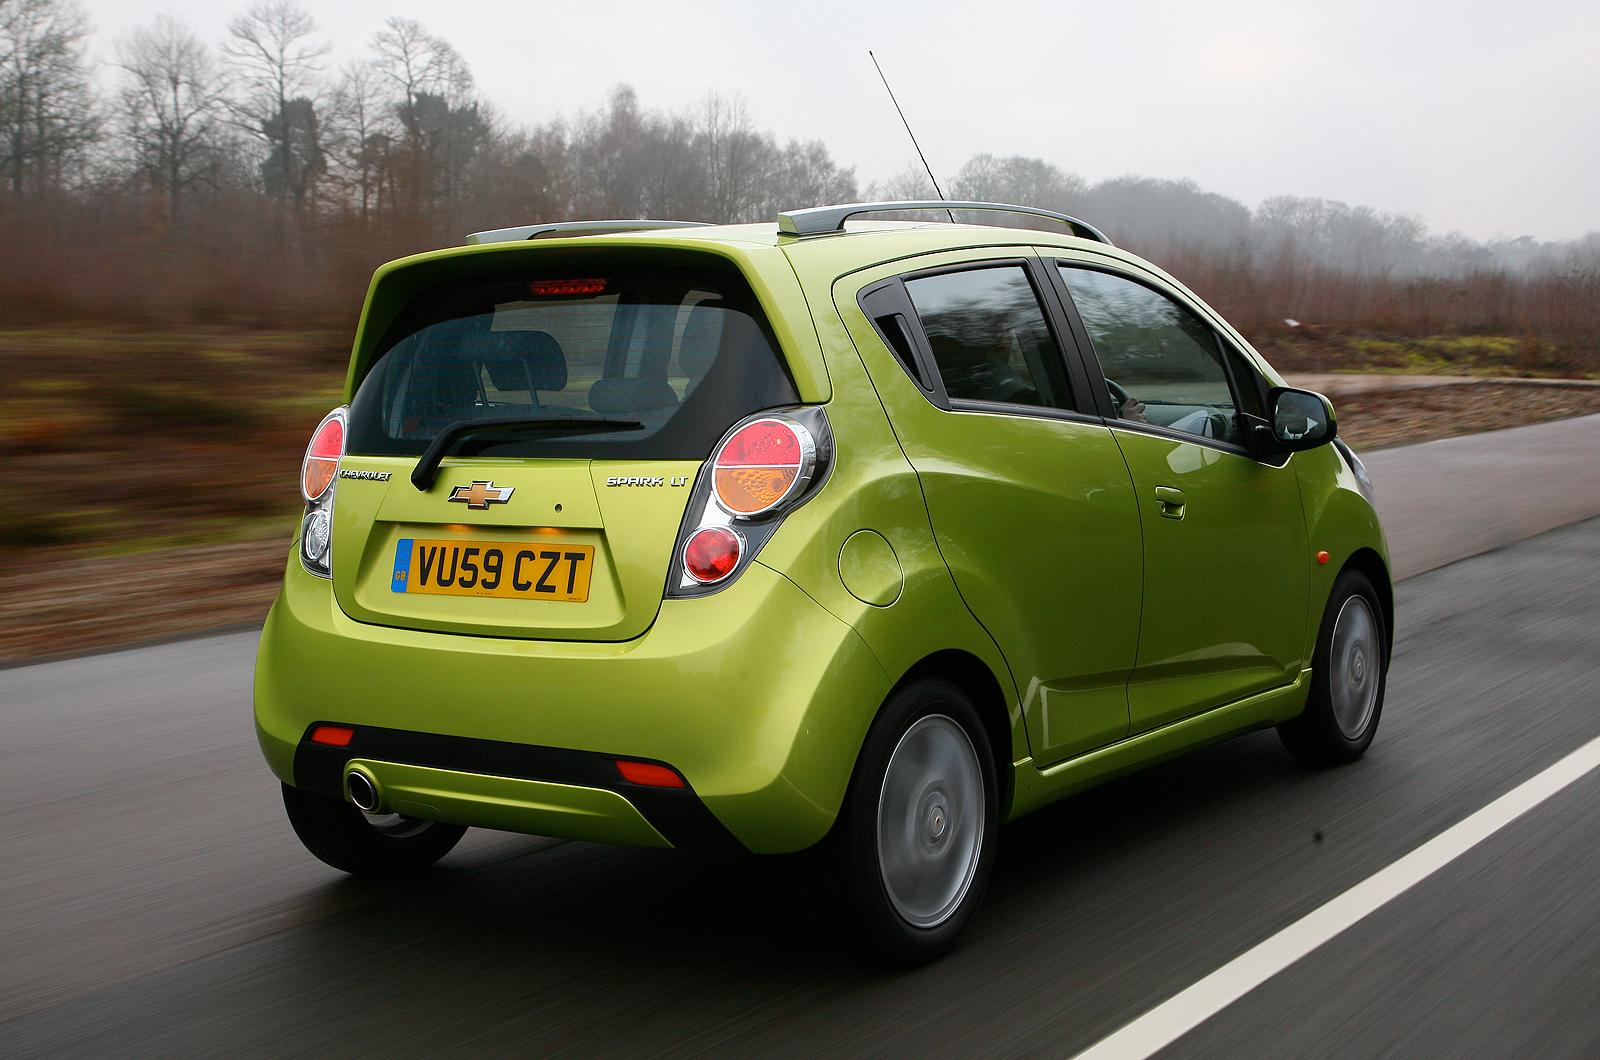 Chevy Spark Gas Mileage >> Chevrolet Spark Gas Mileage | TOPISMAG.NET